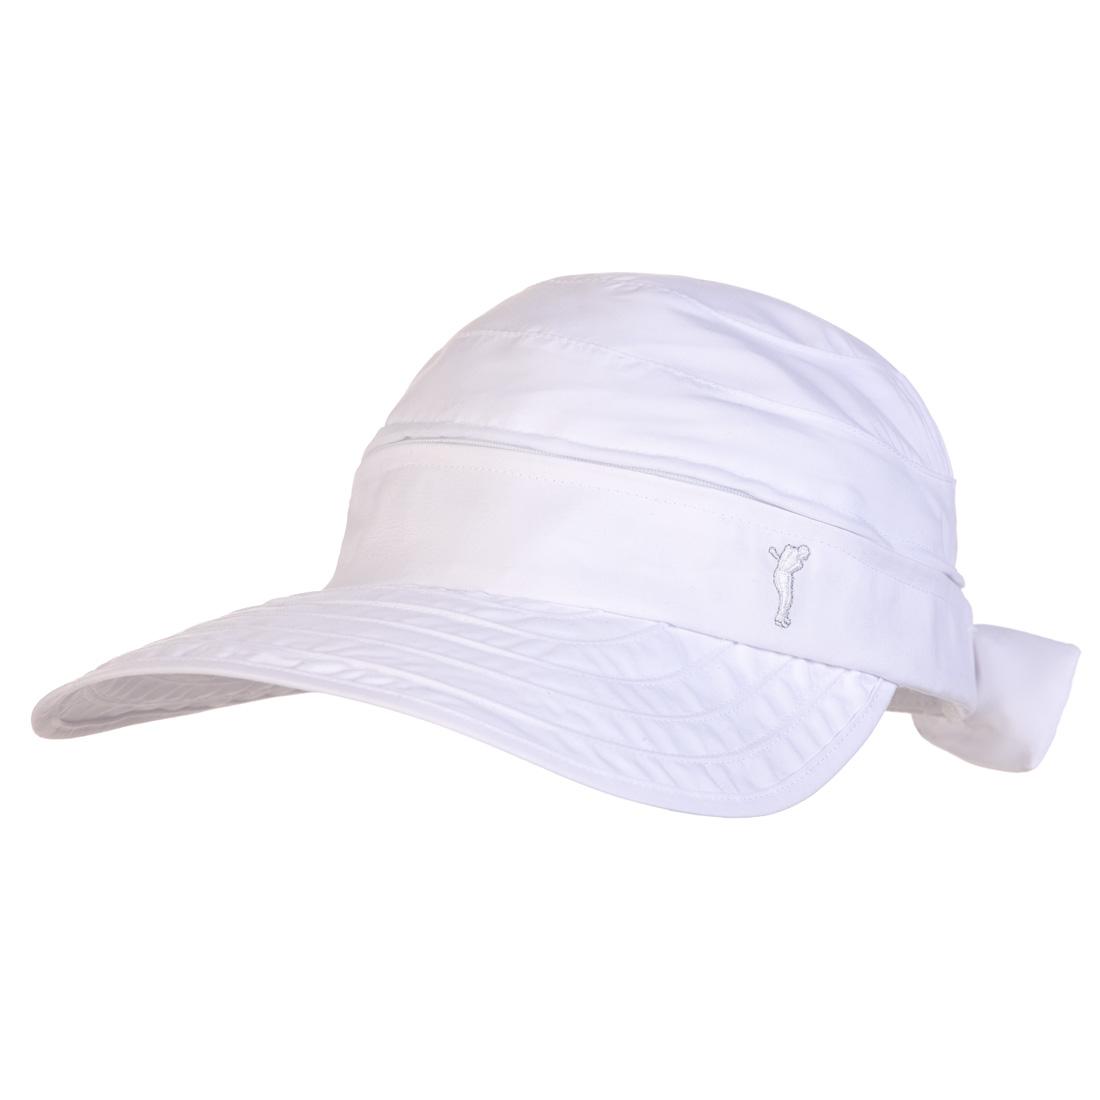 06ddf8ba50faaa Caps for Ladies | GOLFINO | Golfino